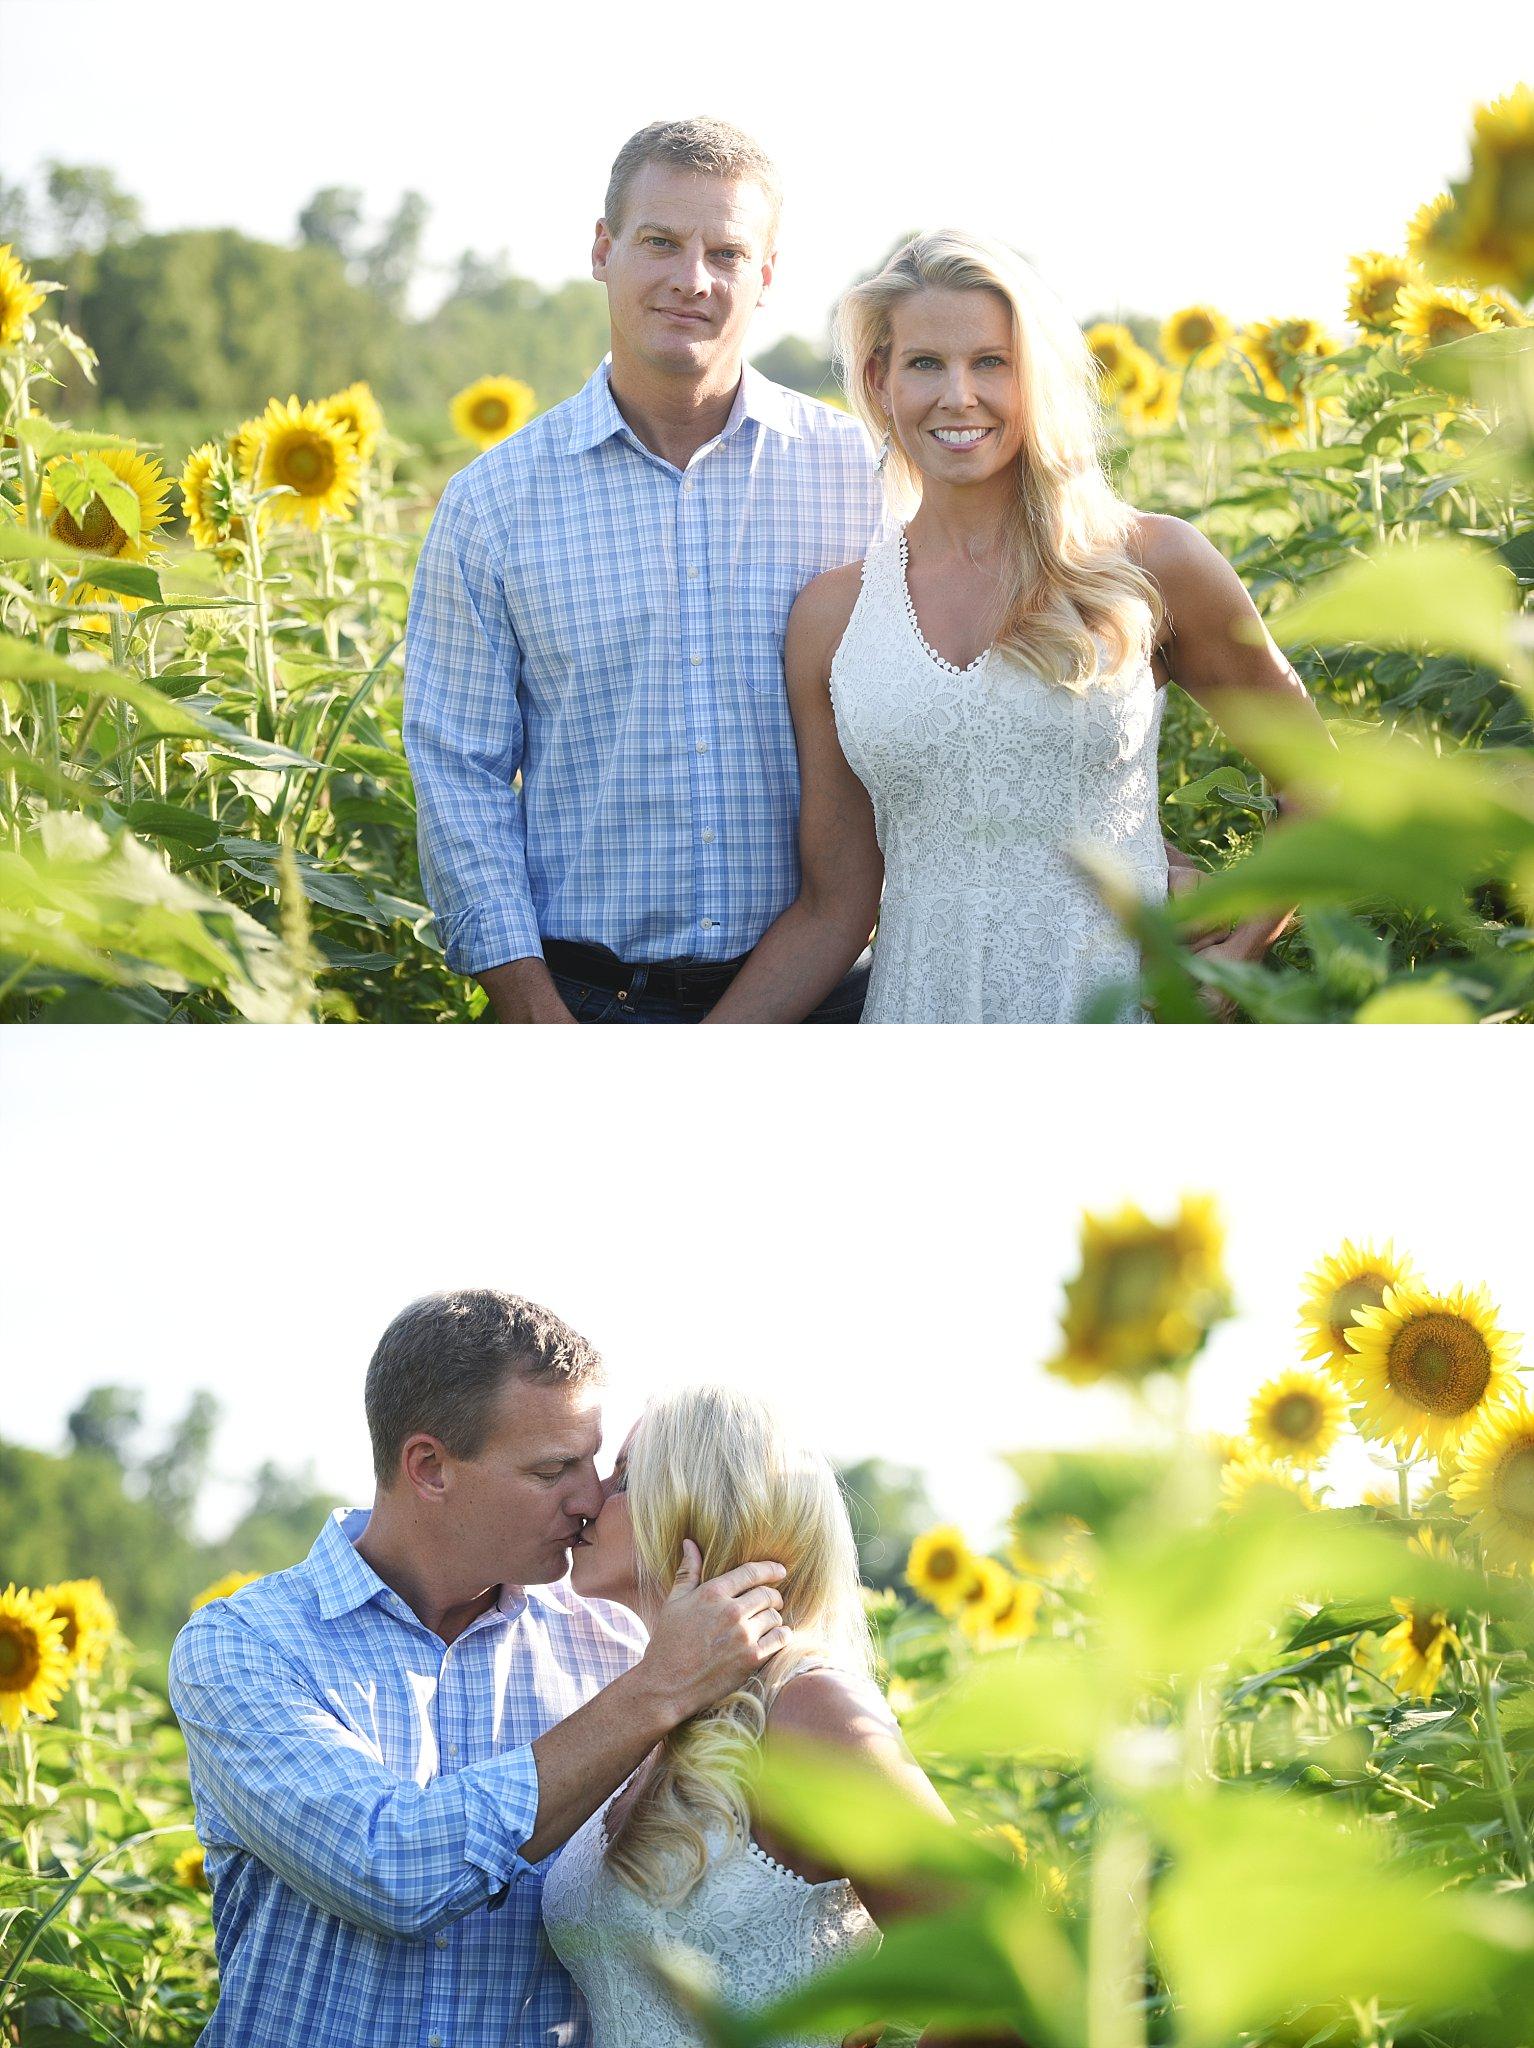 Sunflower-field-Photography-jenfolio_0126.jpg